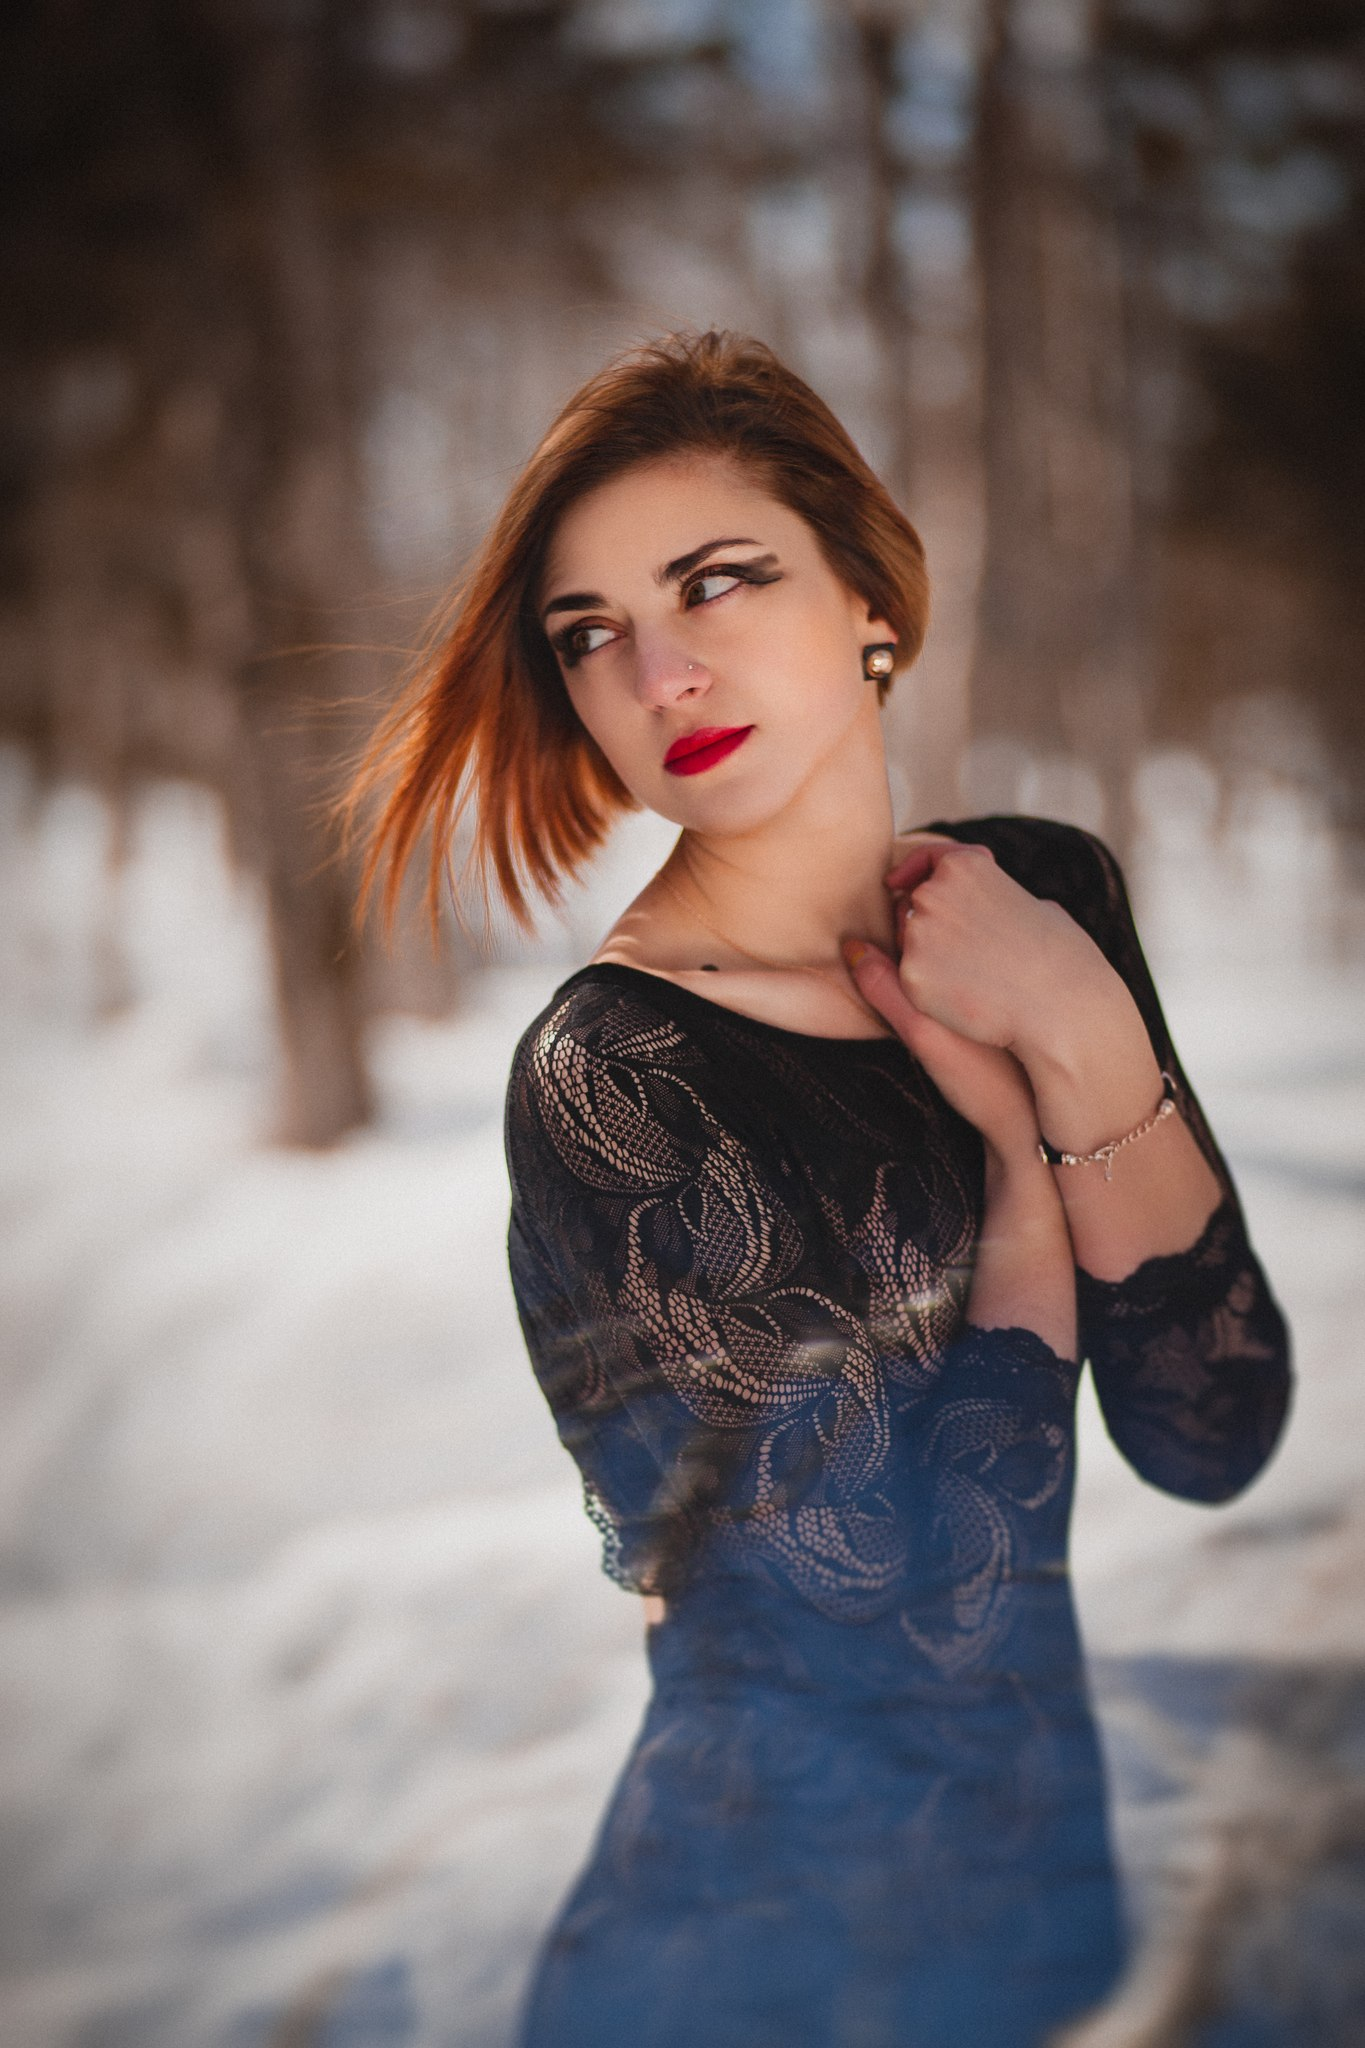 ryzhie-volosy-foto_9